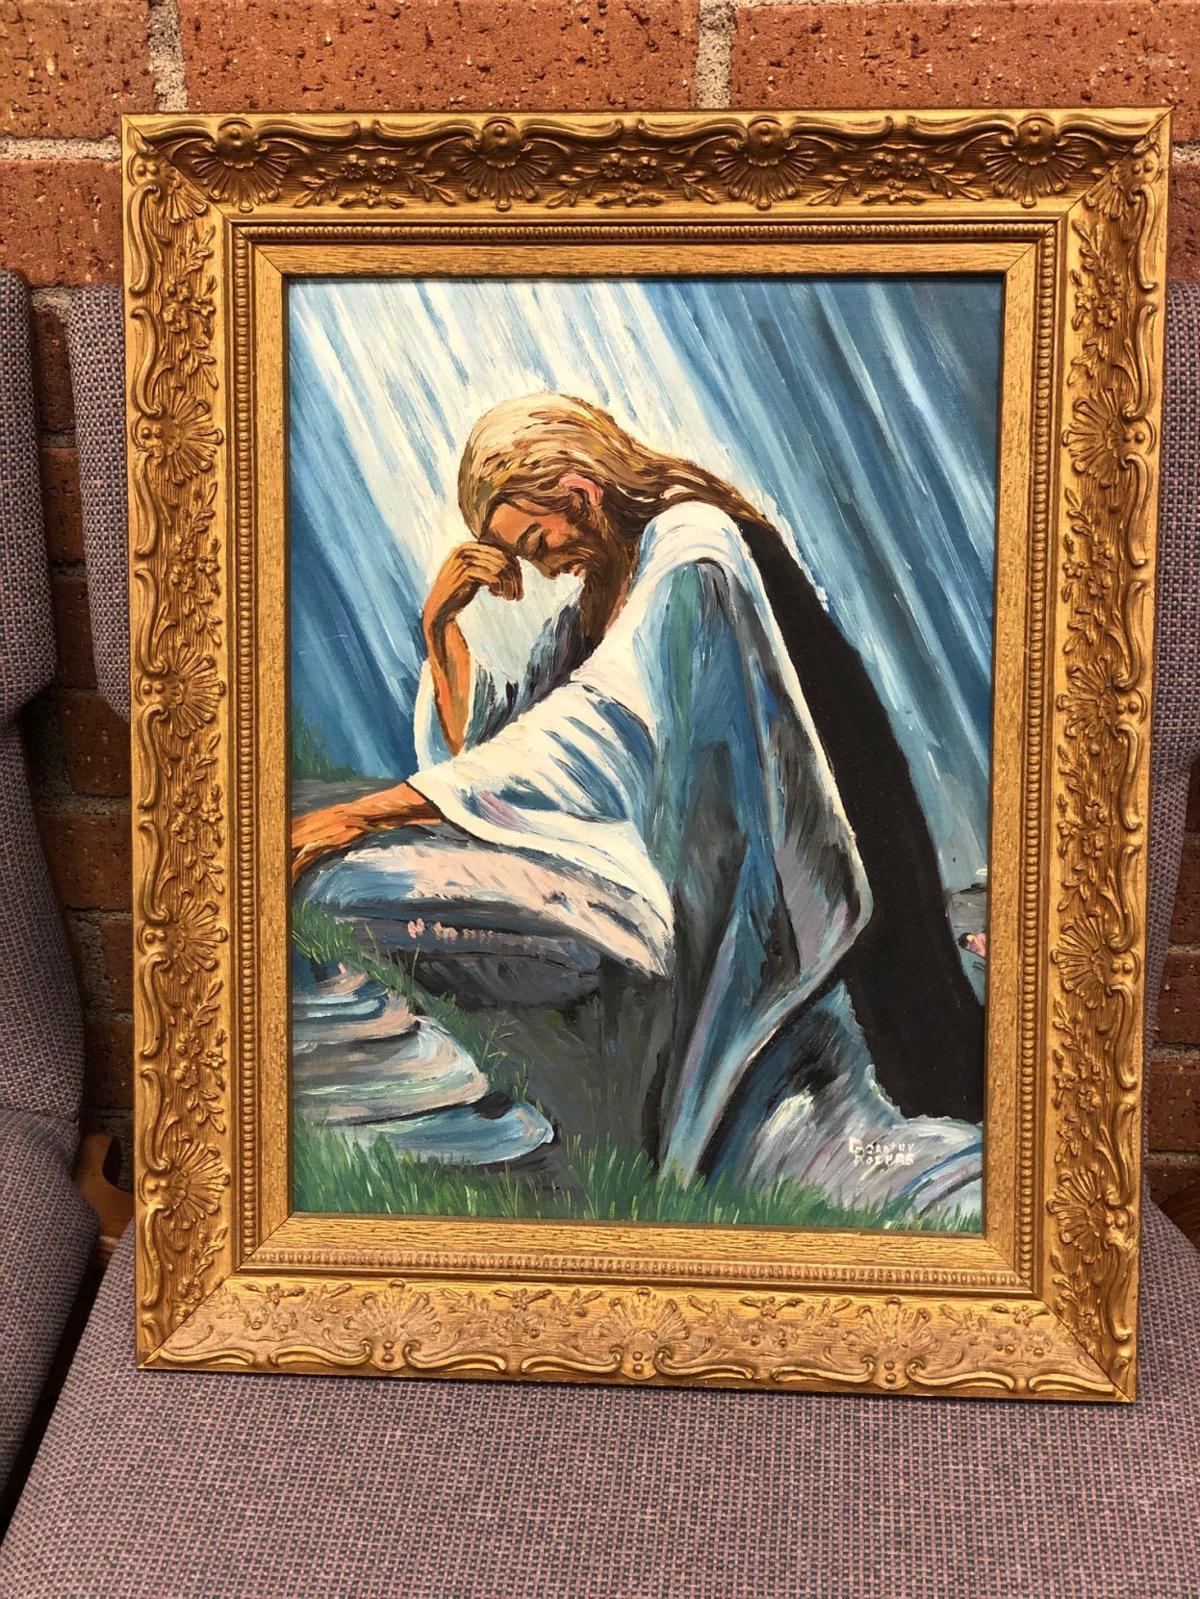 Zion's Lutheran art show